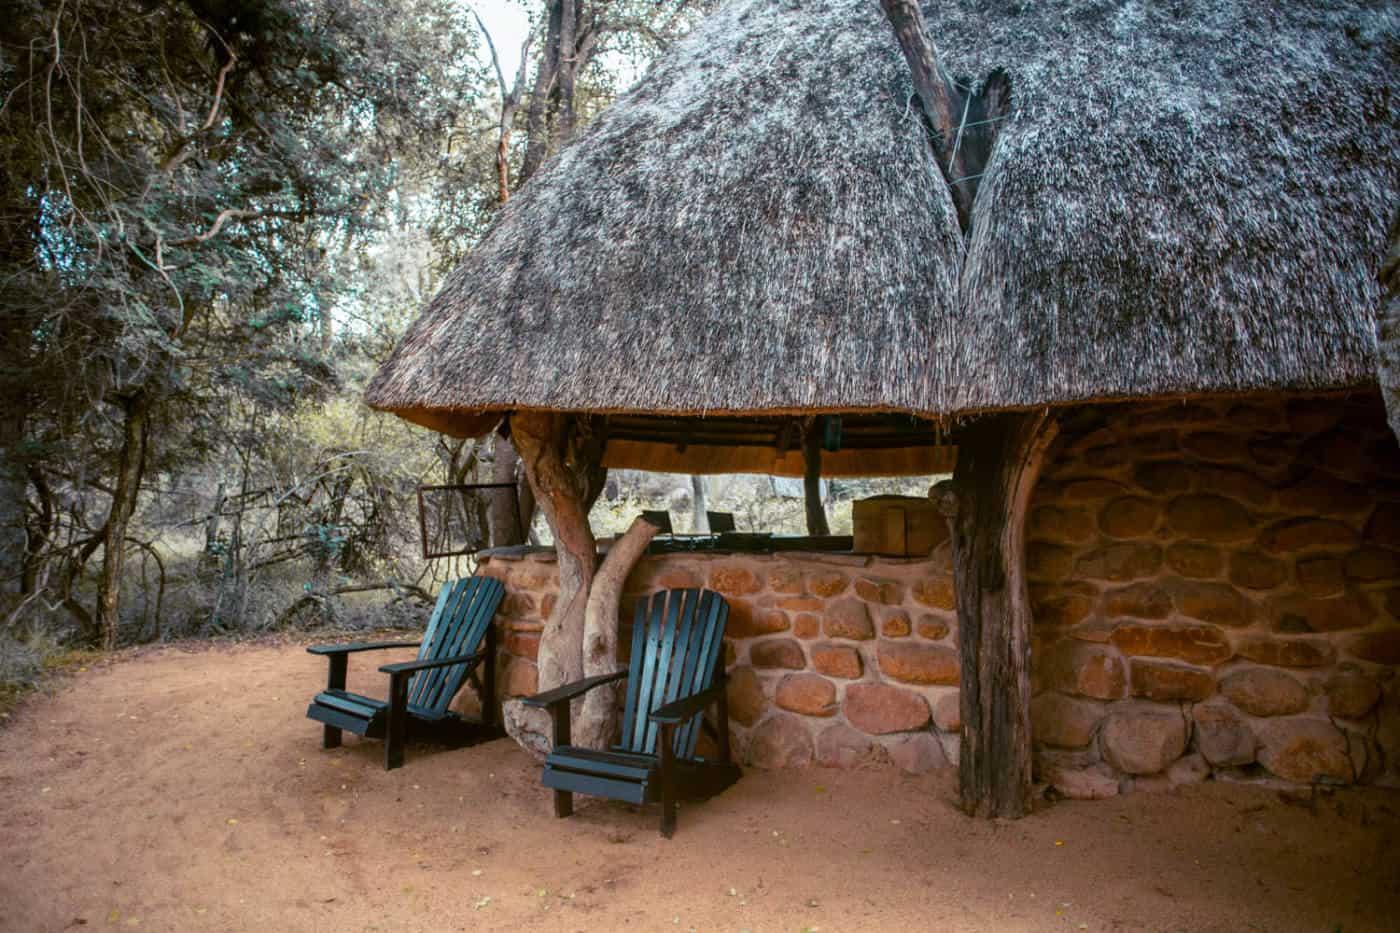 Swaziland safari Mkhaya camp